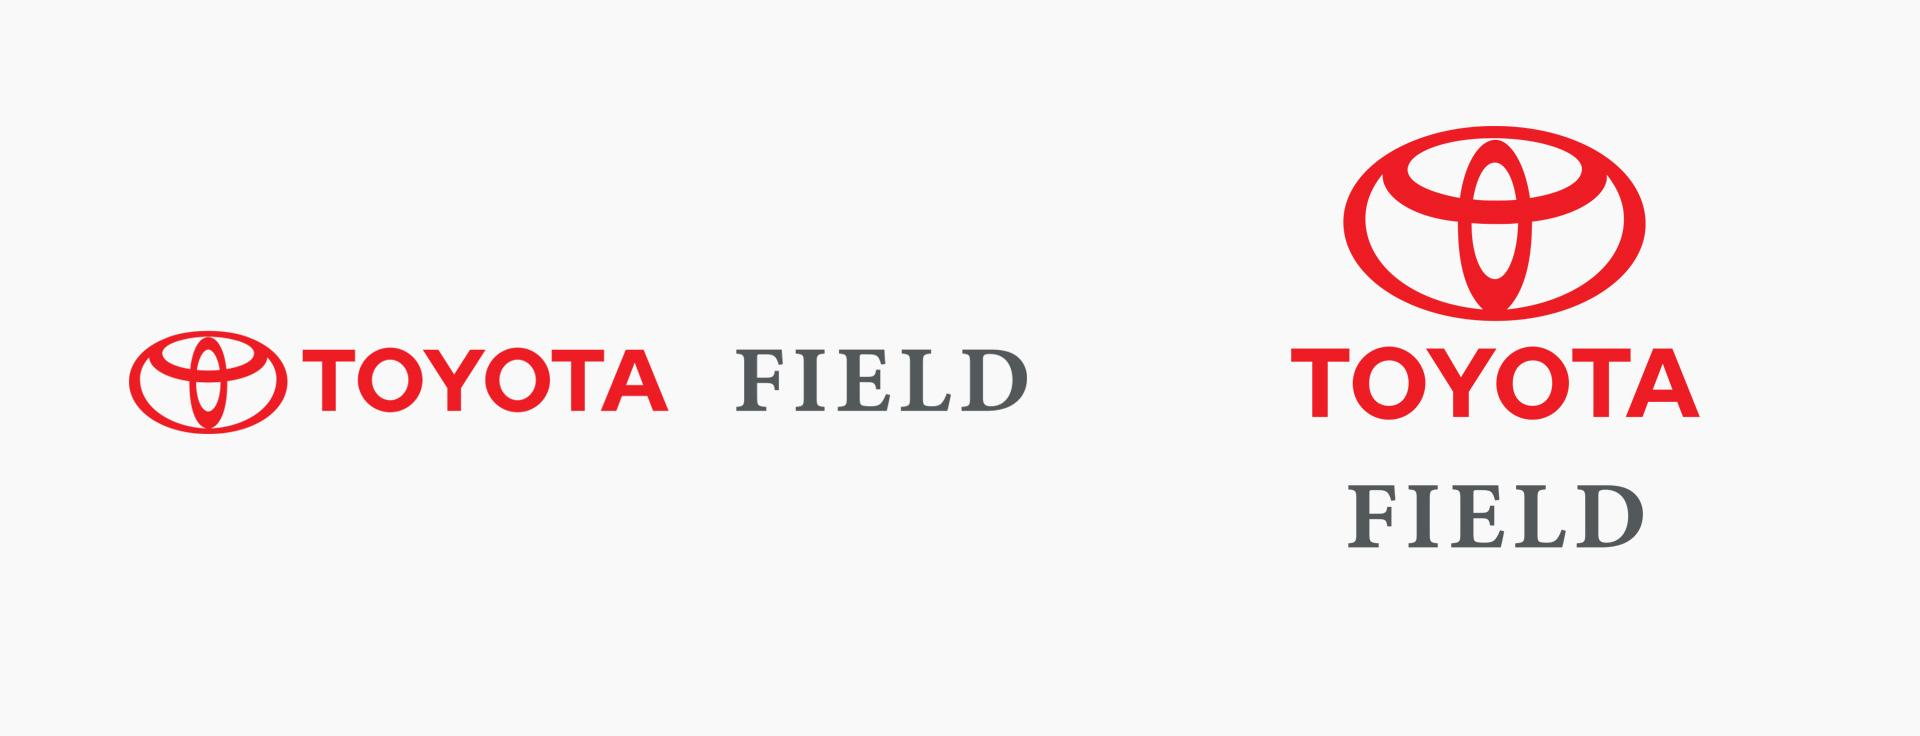 Toyota Field Logo White